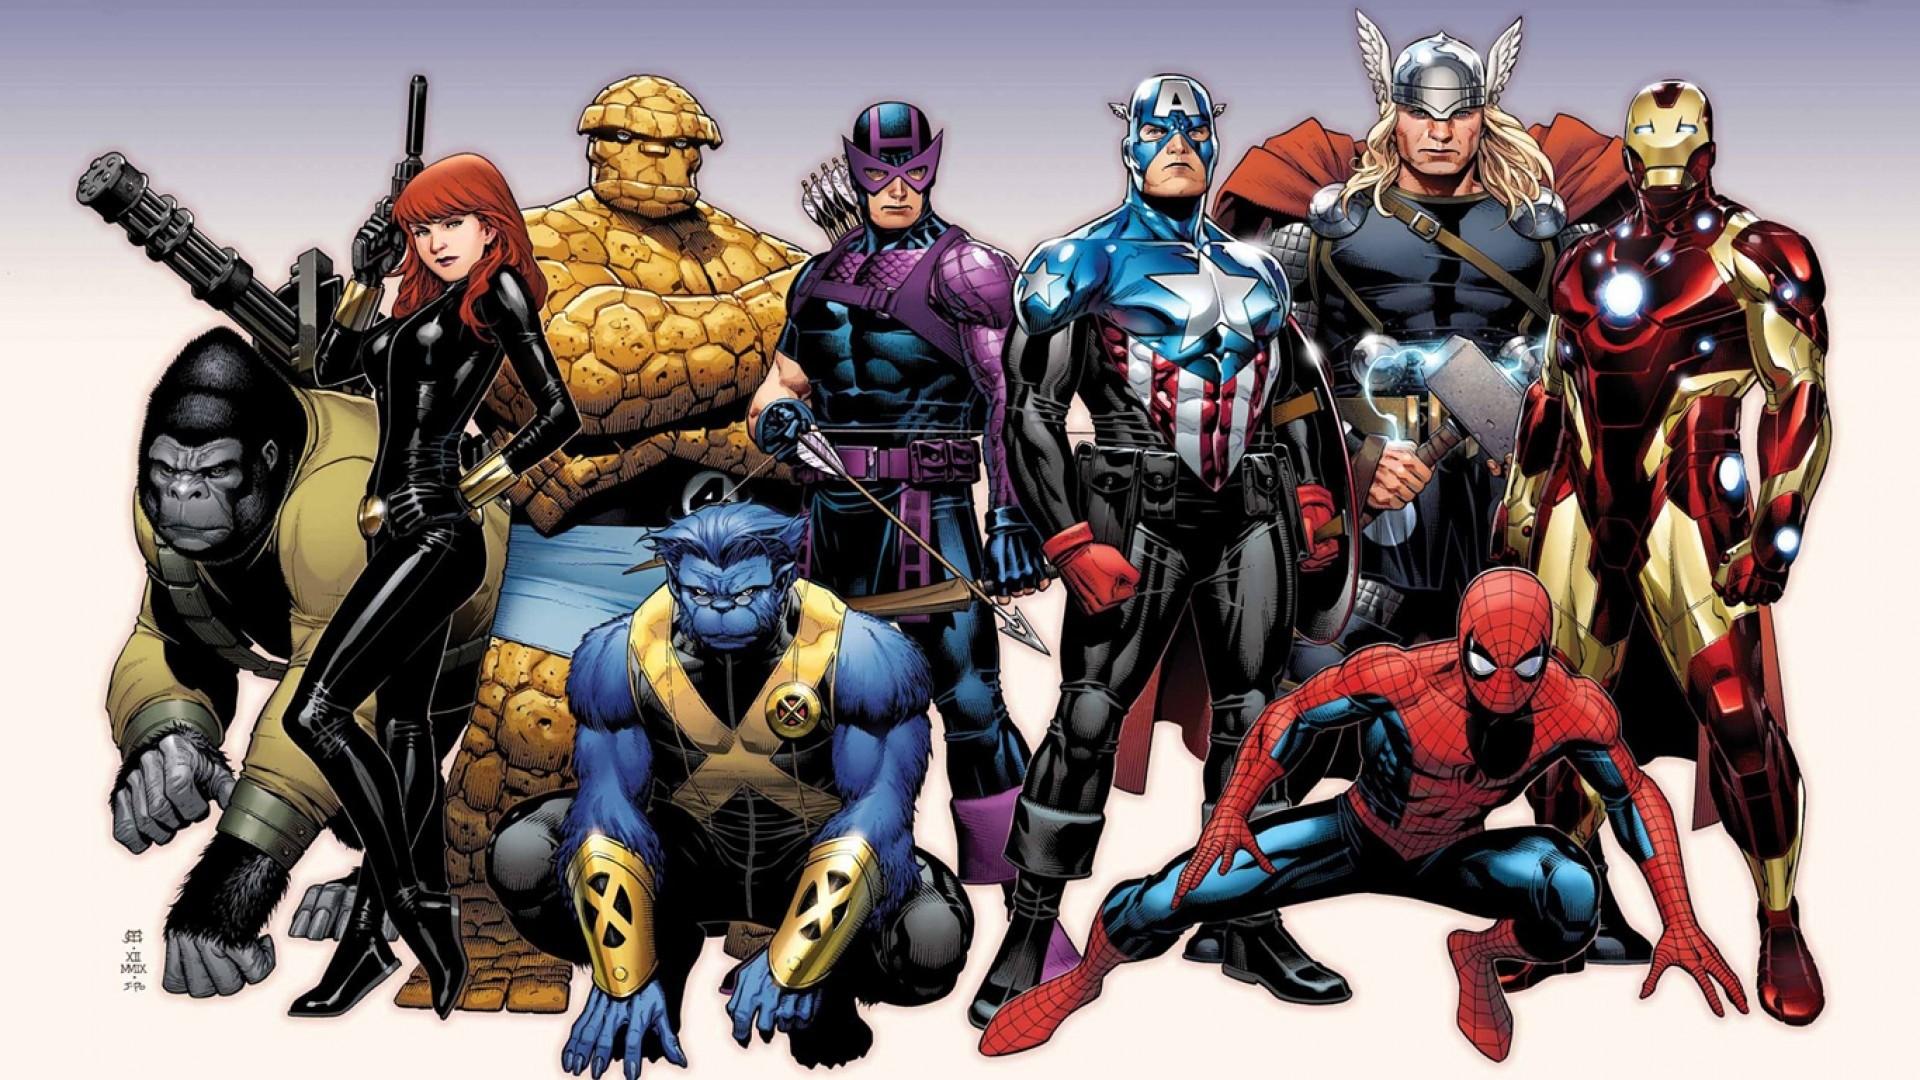 HD Wallpaper Marvel Heroes Download HD Wallpaper Marvel Heroes 1920×1080  Heroes HD Wallpapers (